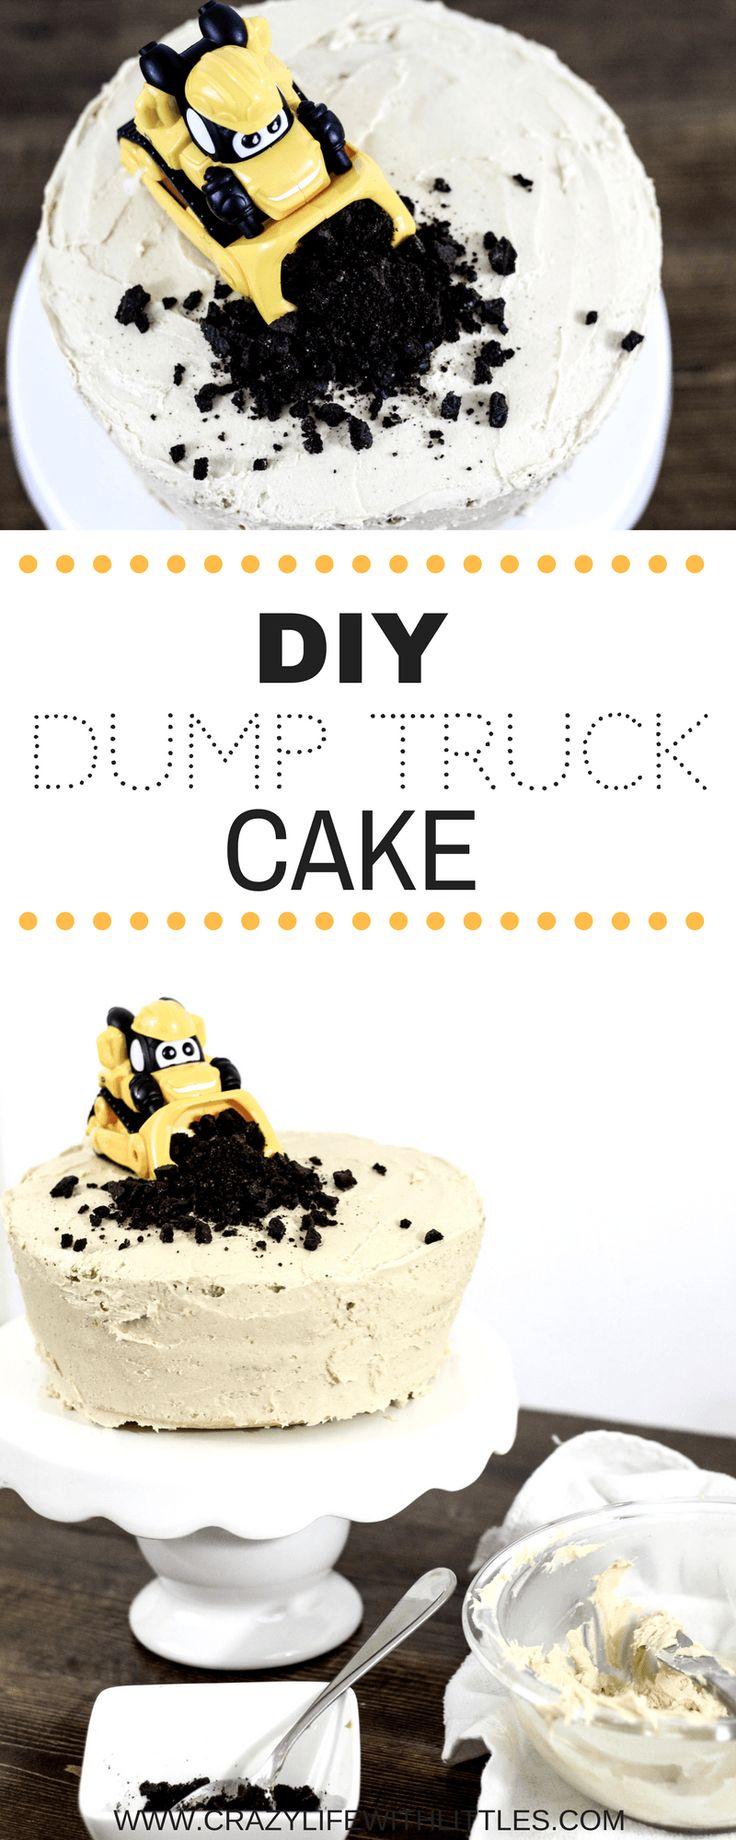 dump truck cake, diy vanilla cake, homemade cake recipe, dump truck birthday, construction birthday, easy peanut butter icing recipe, boys birthday party